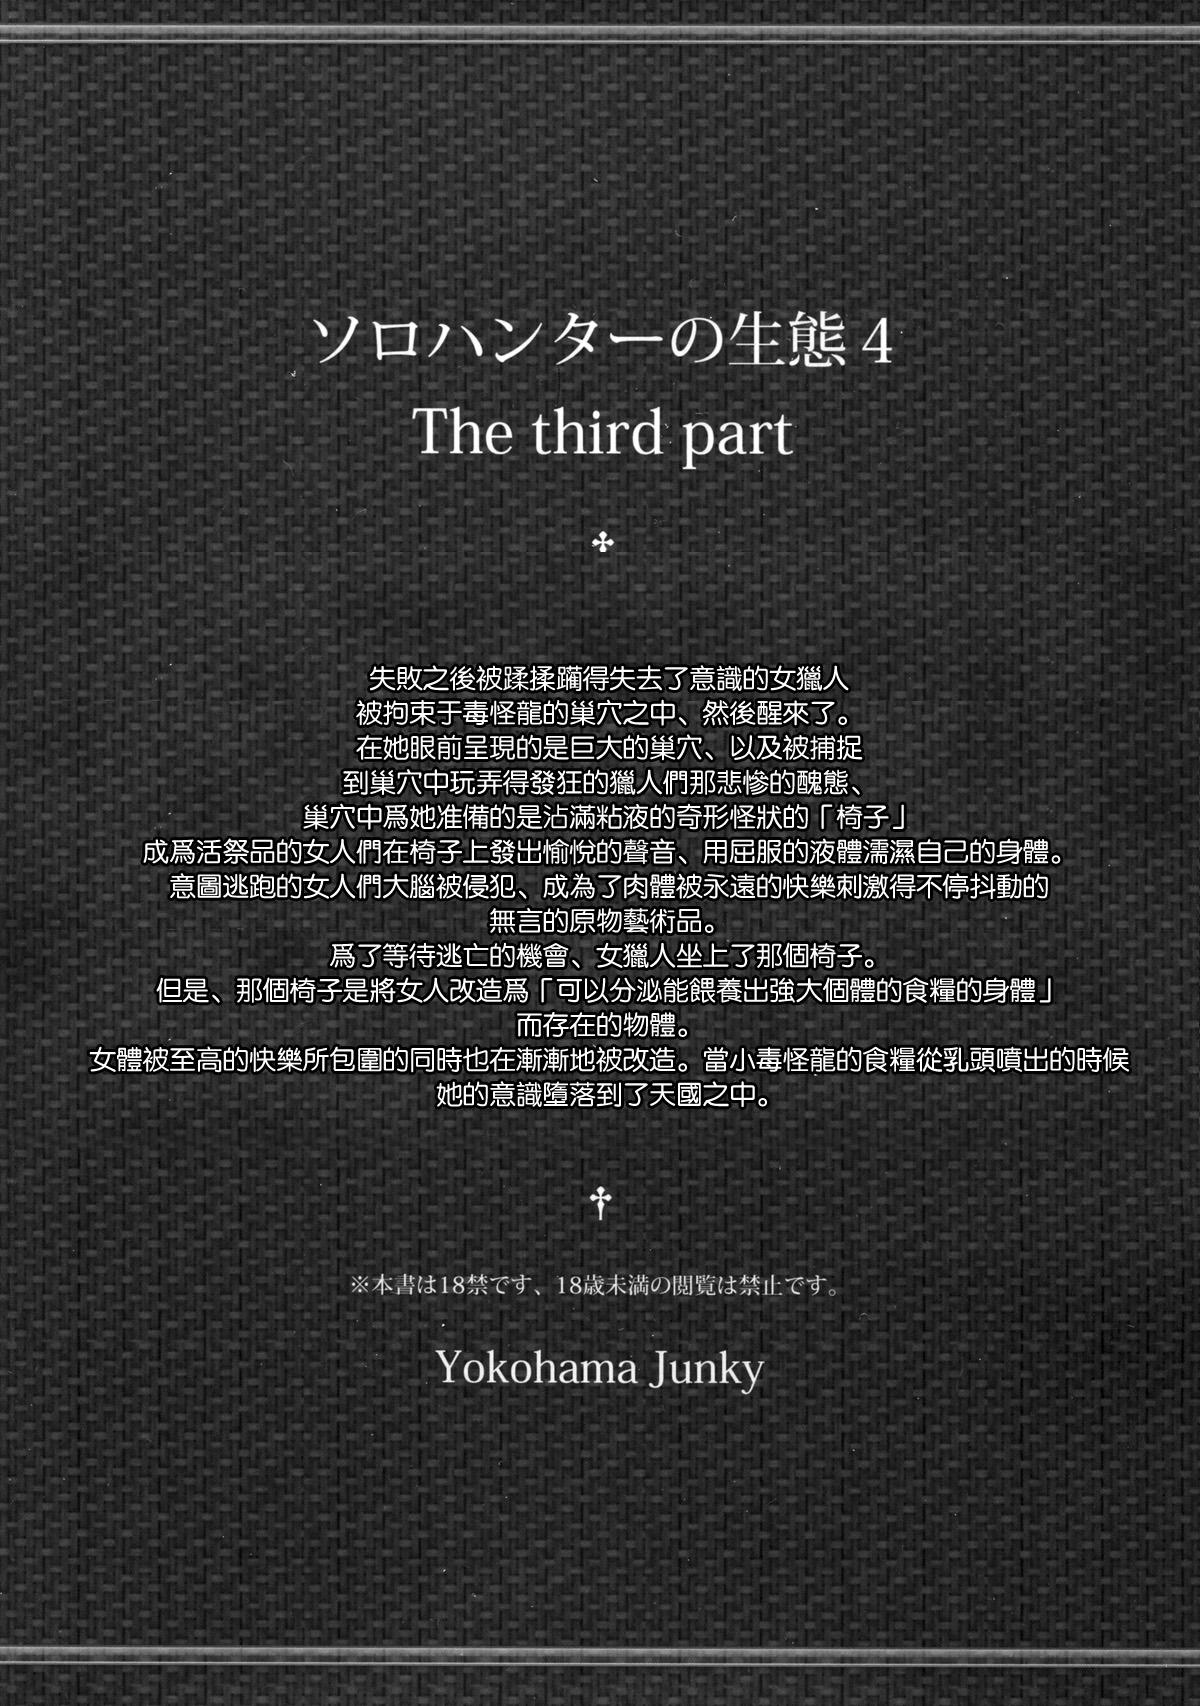 Solo Hunter no Seitai 4 The third part 1